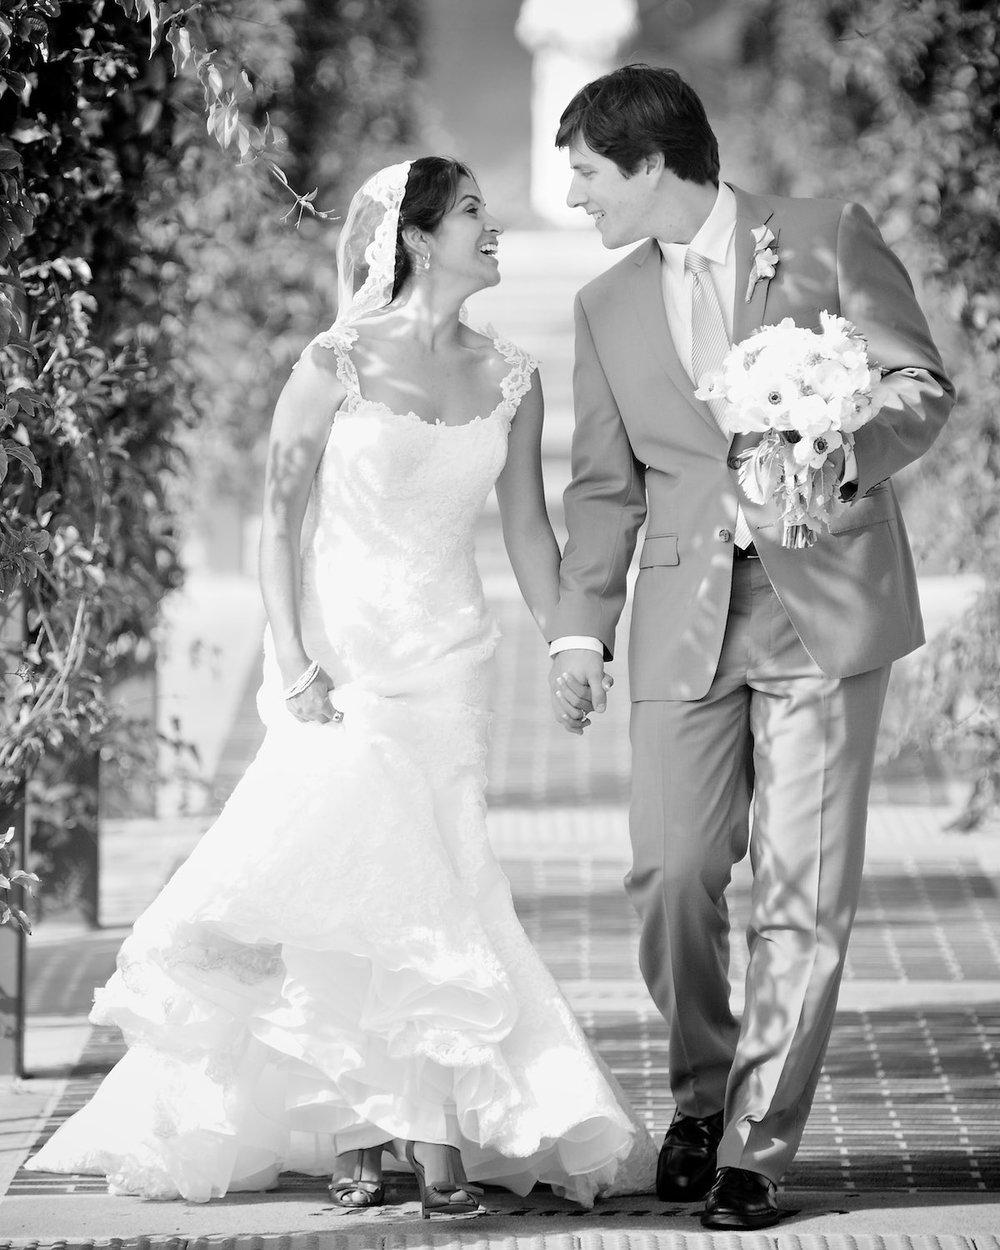 irvine-wedding-michal-pfeil-21.jpg